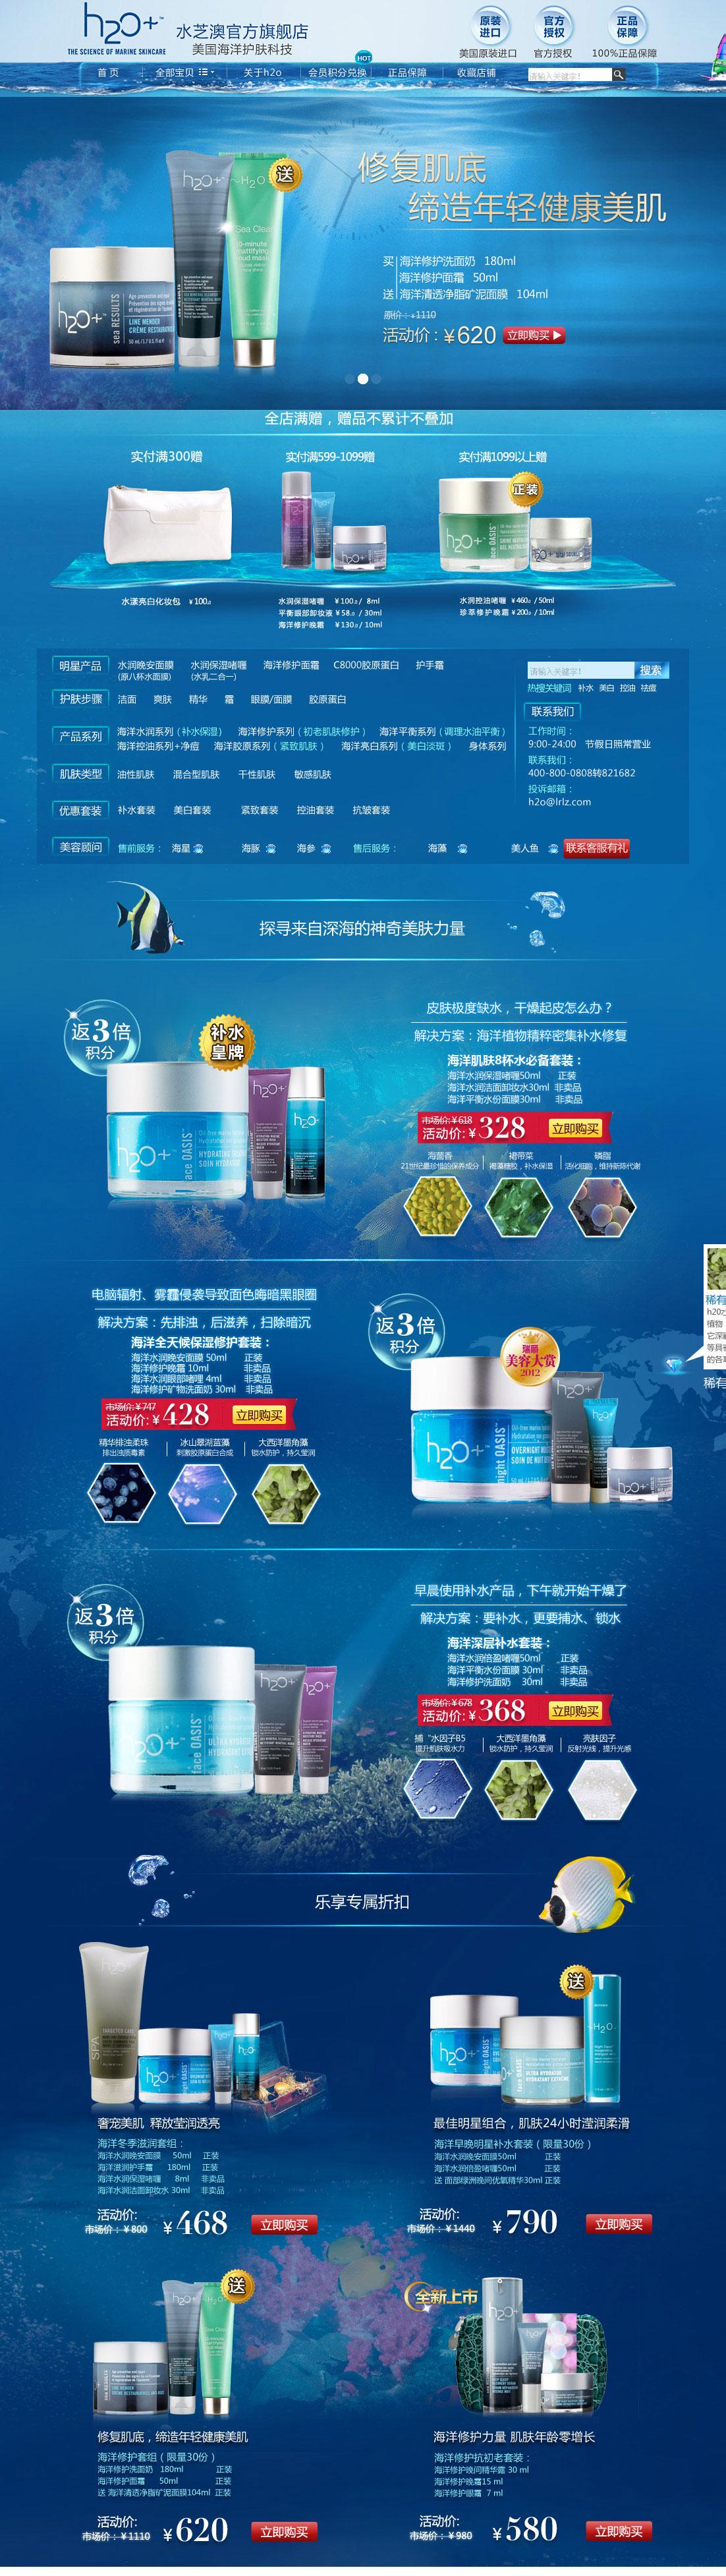 h2o水芝澳官方旗舰店店铺首页设计